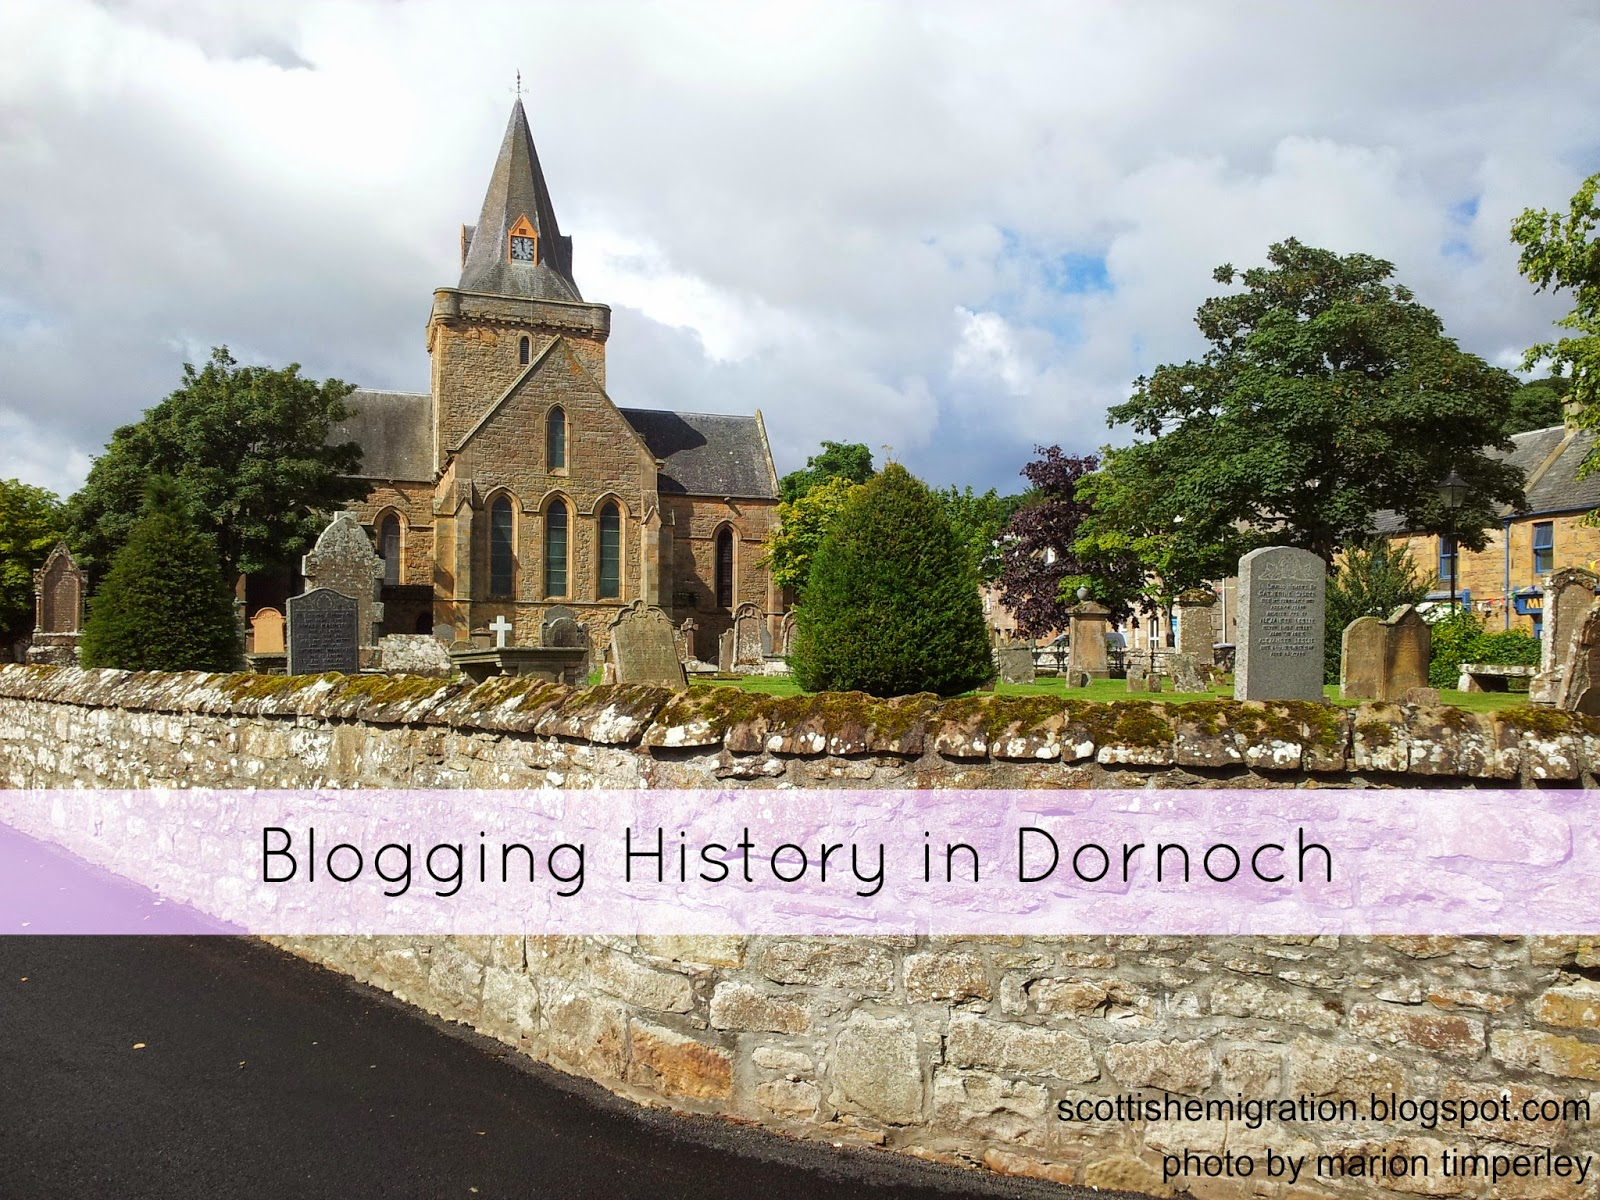 dornoch, emigration, fraser, croick church, glencalvie, minister